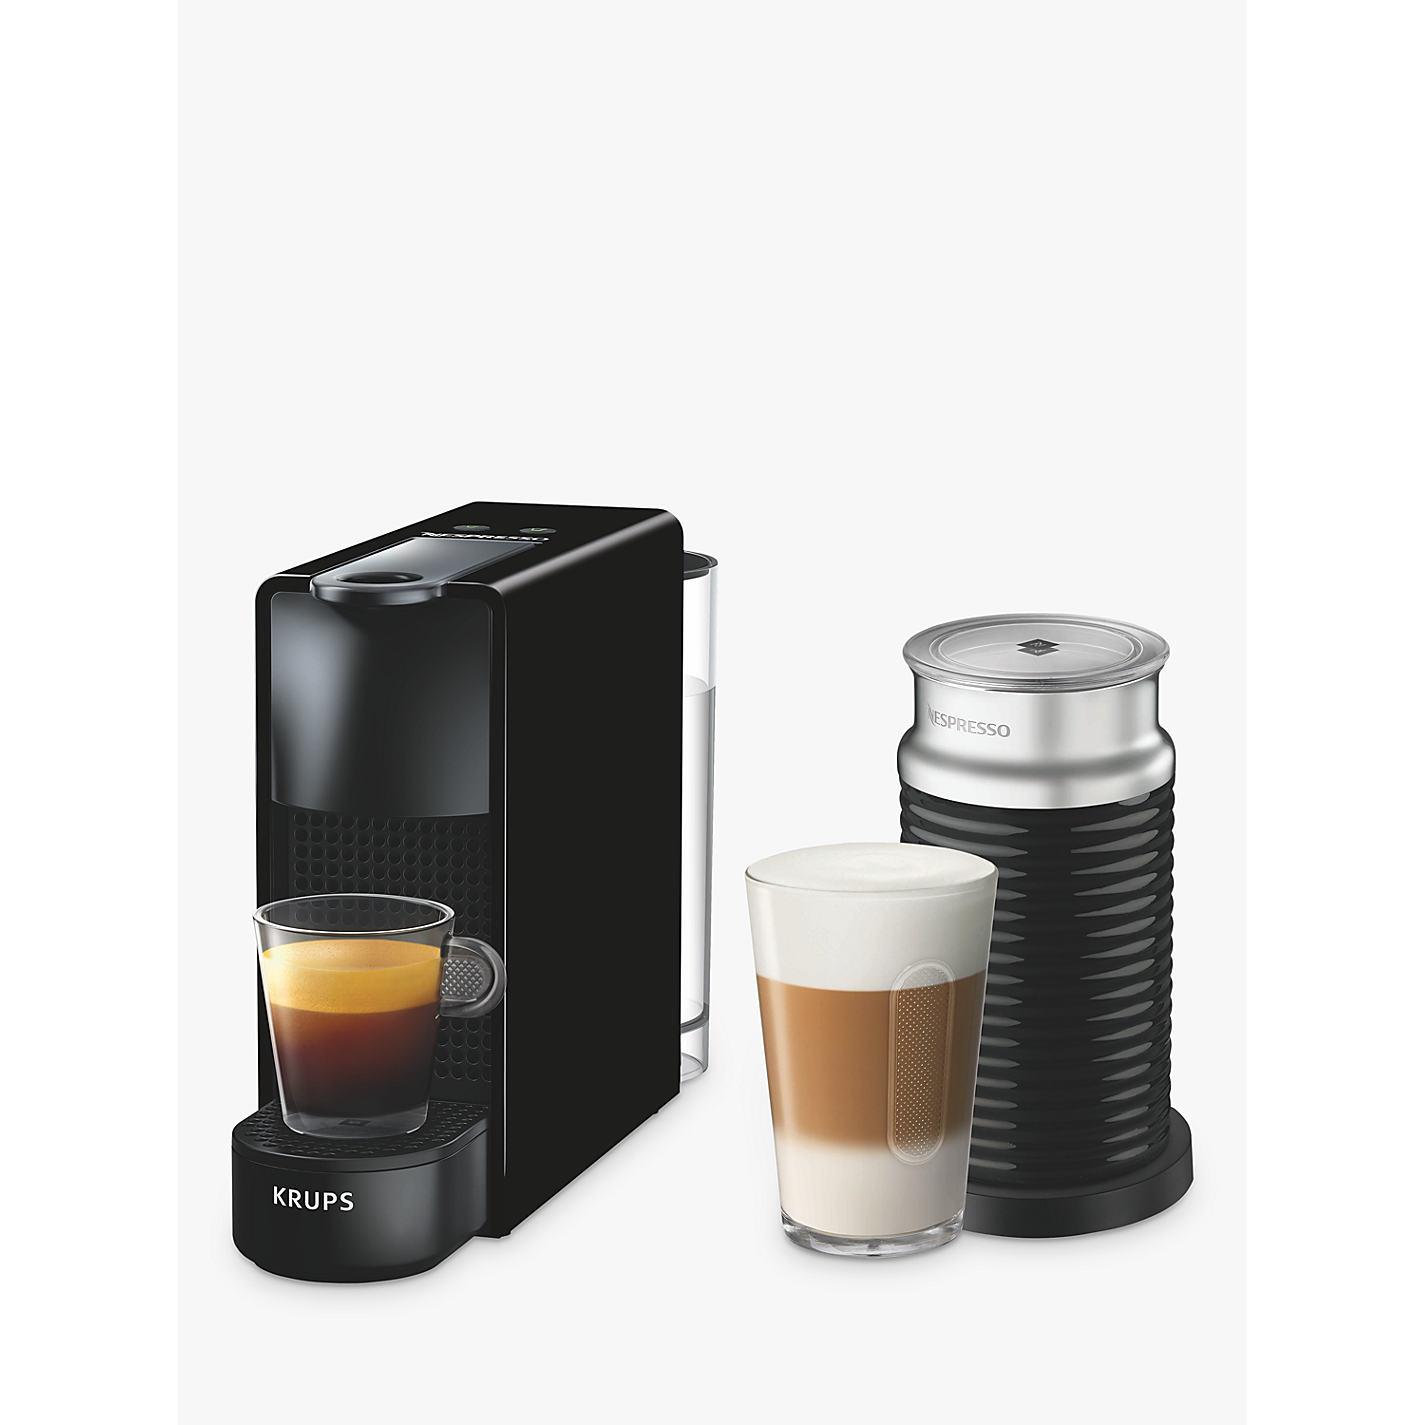 krups nespresso xn1101 essenza mini kaffeekapselmaschine 1260 watt thermoblock heizsystem 0 7. Black Bedroom Furniture Sets. Home Design Ideas